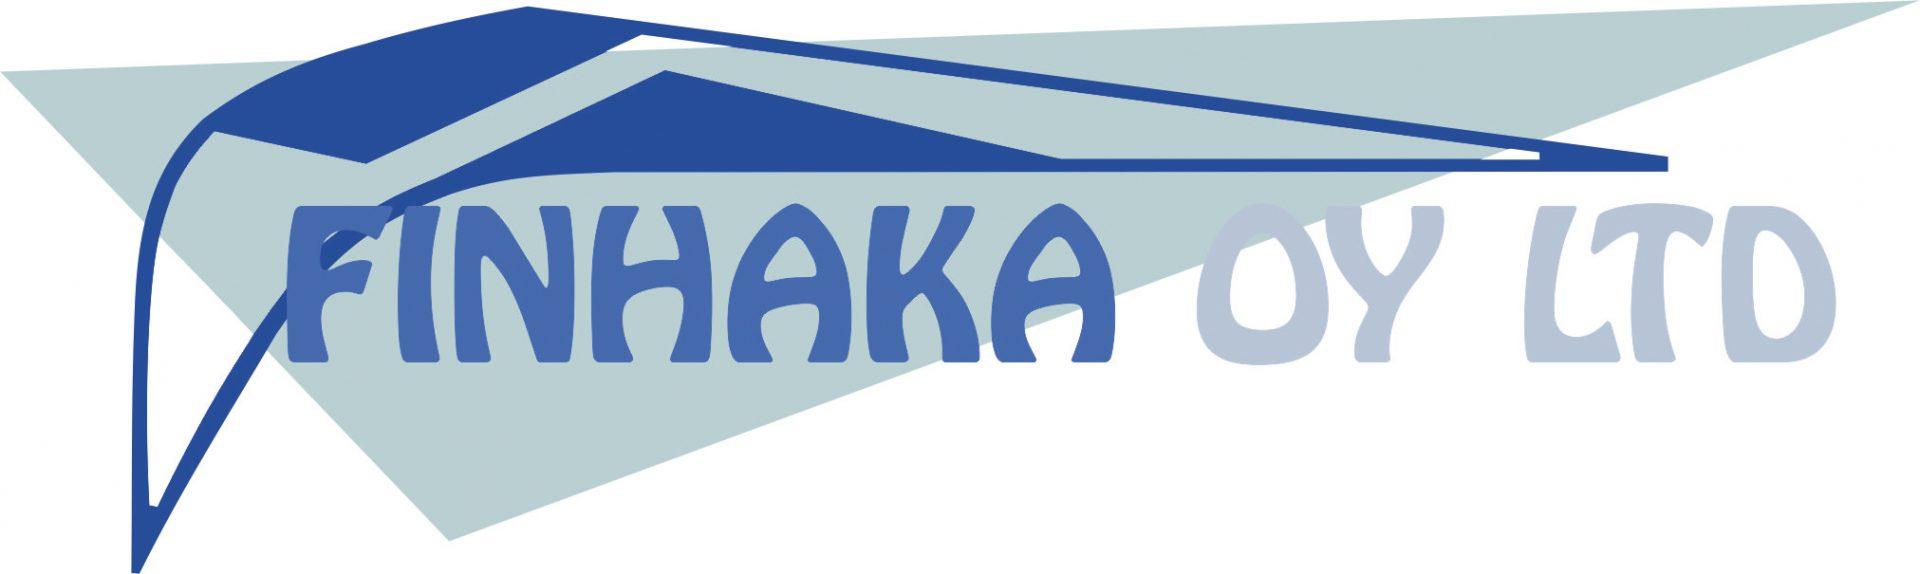 Finhaka Oy